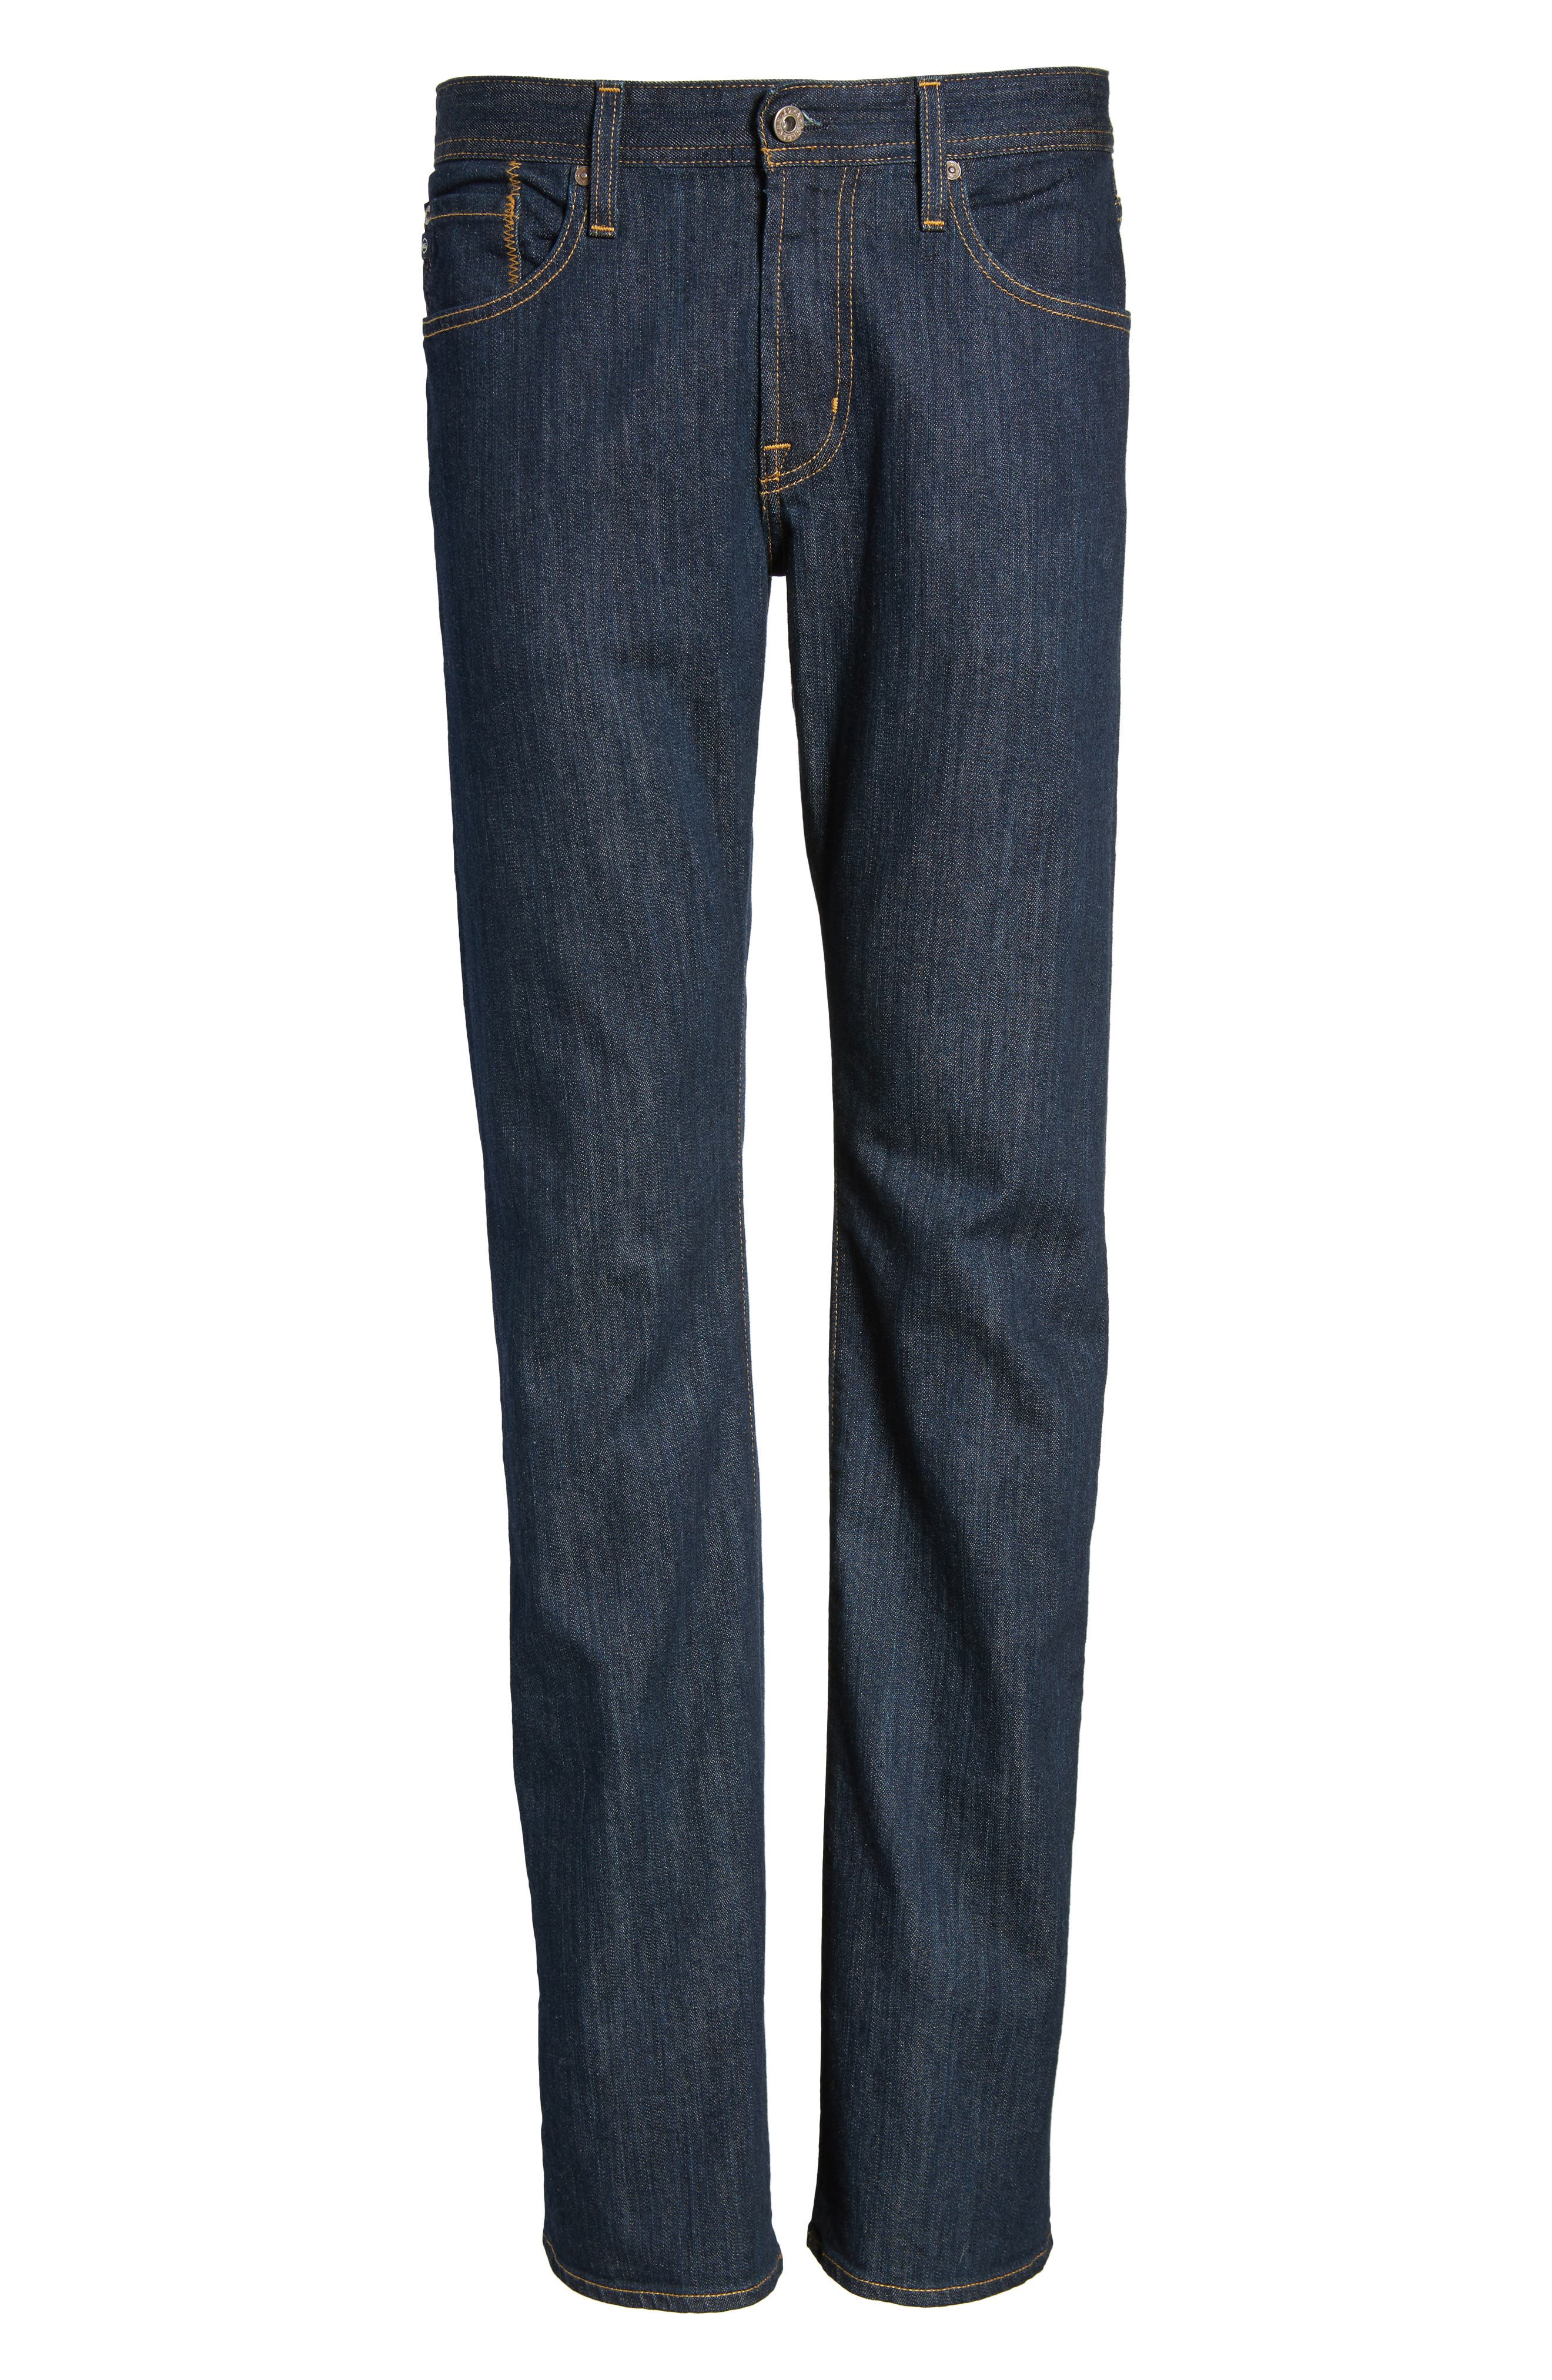 'Protégé' Straight Leg Jeans,                             Alternate thumbnail 6, color,                             016